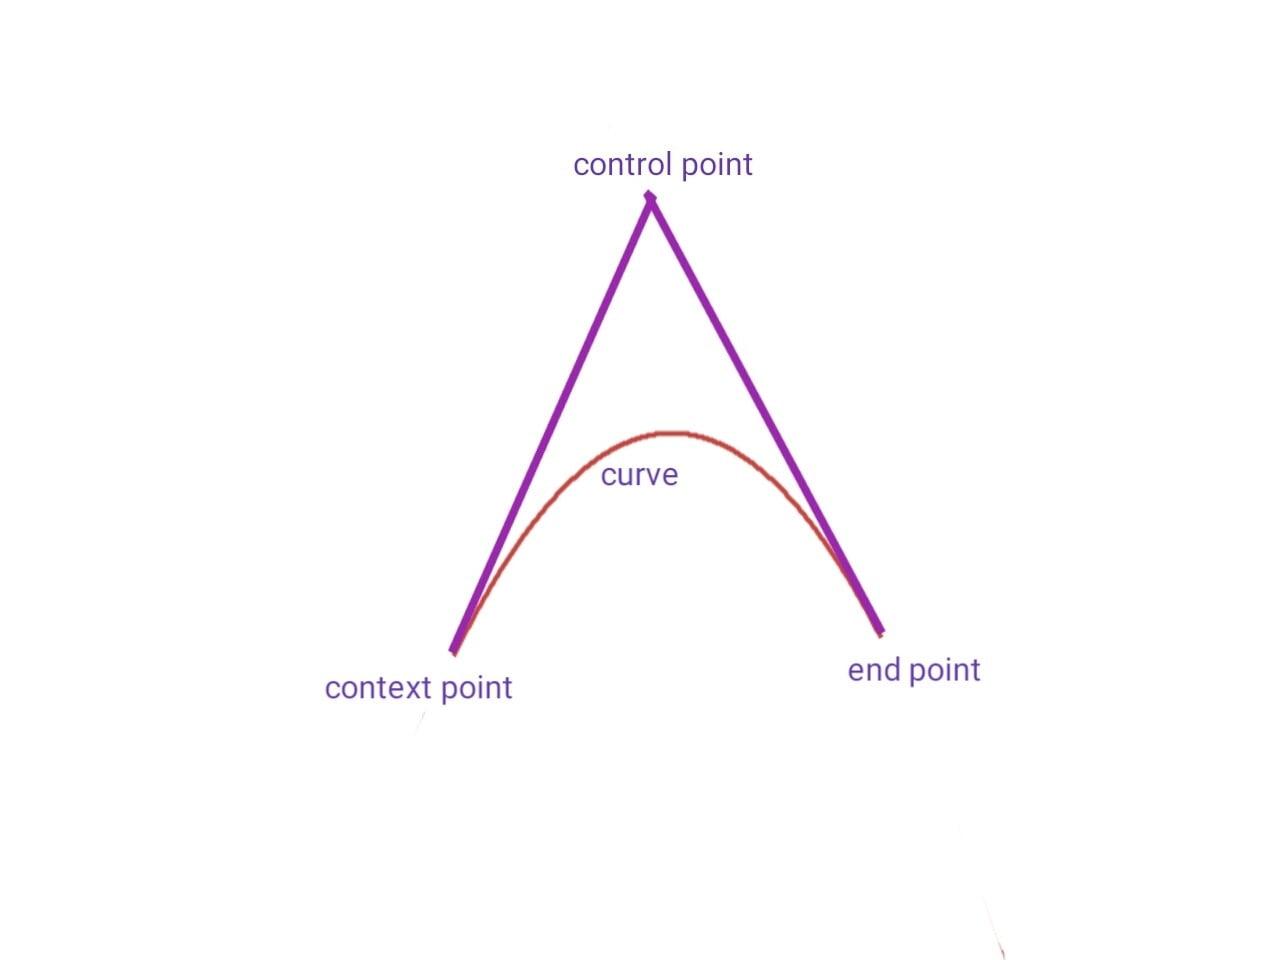 quadratic bezier curve